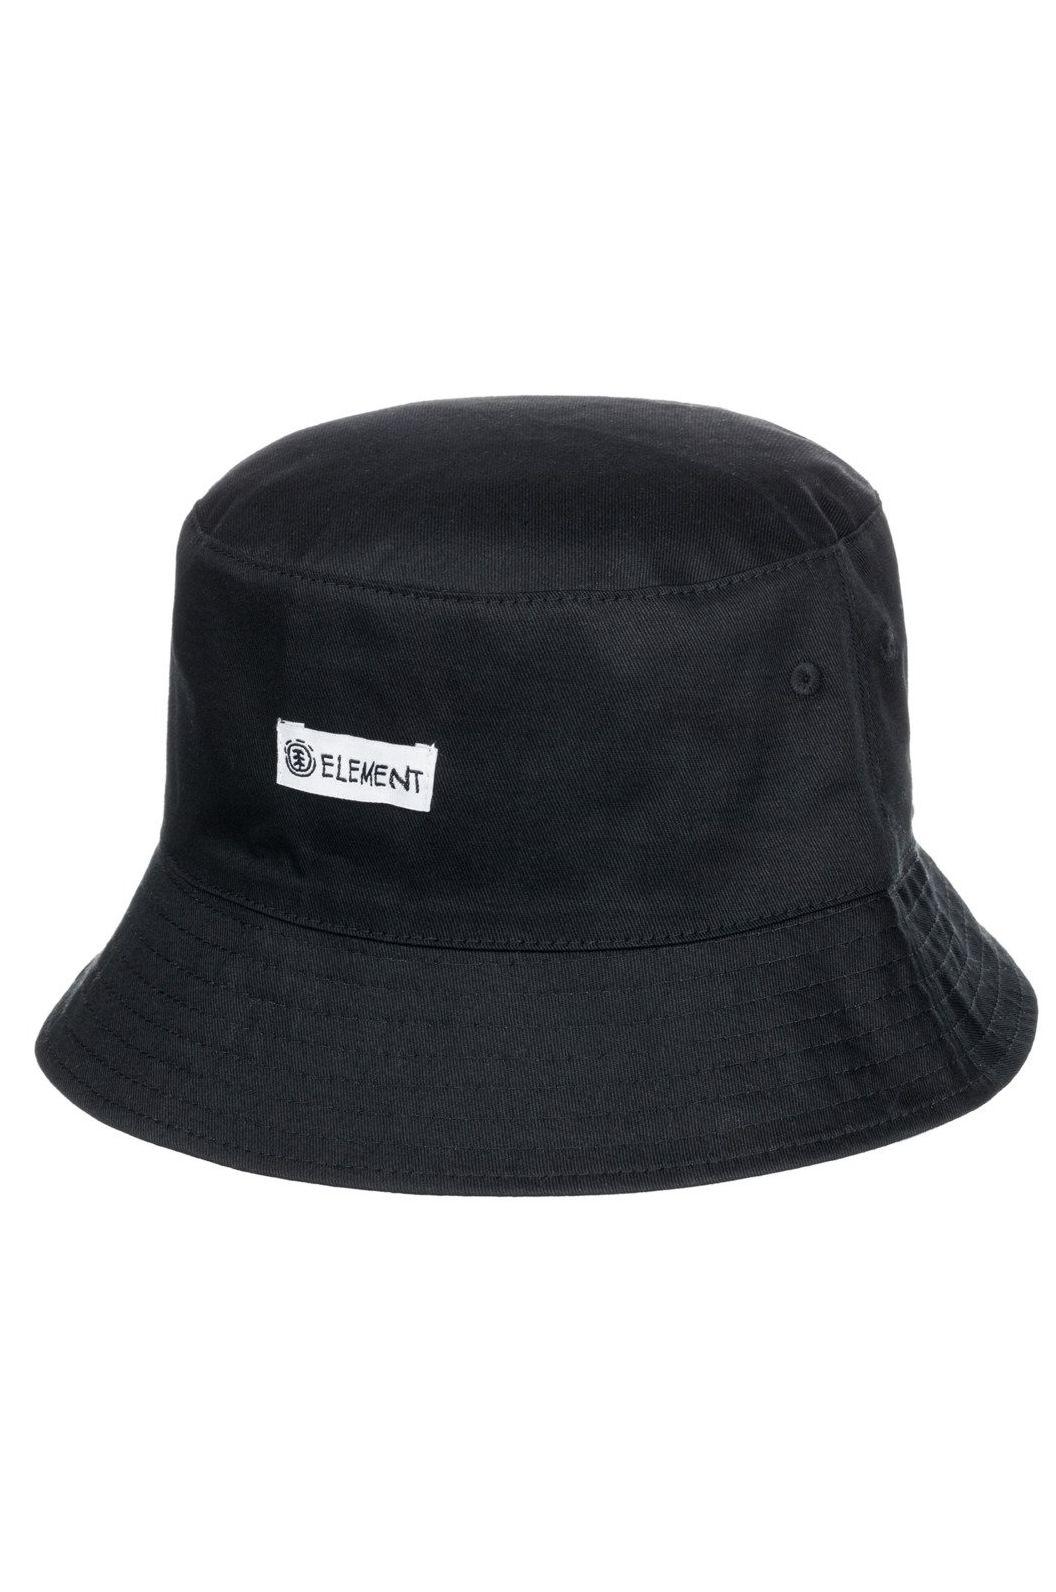 Chapeu Element SHROOMS BUCKET HAT SHROOMS PACK Flint Black